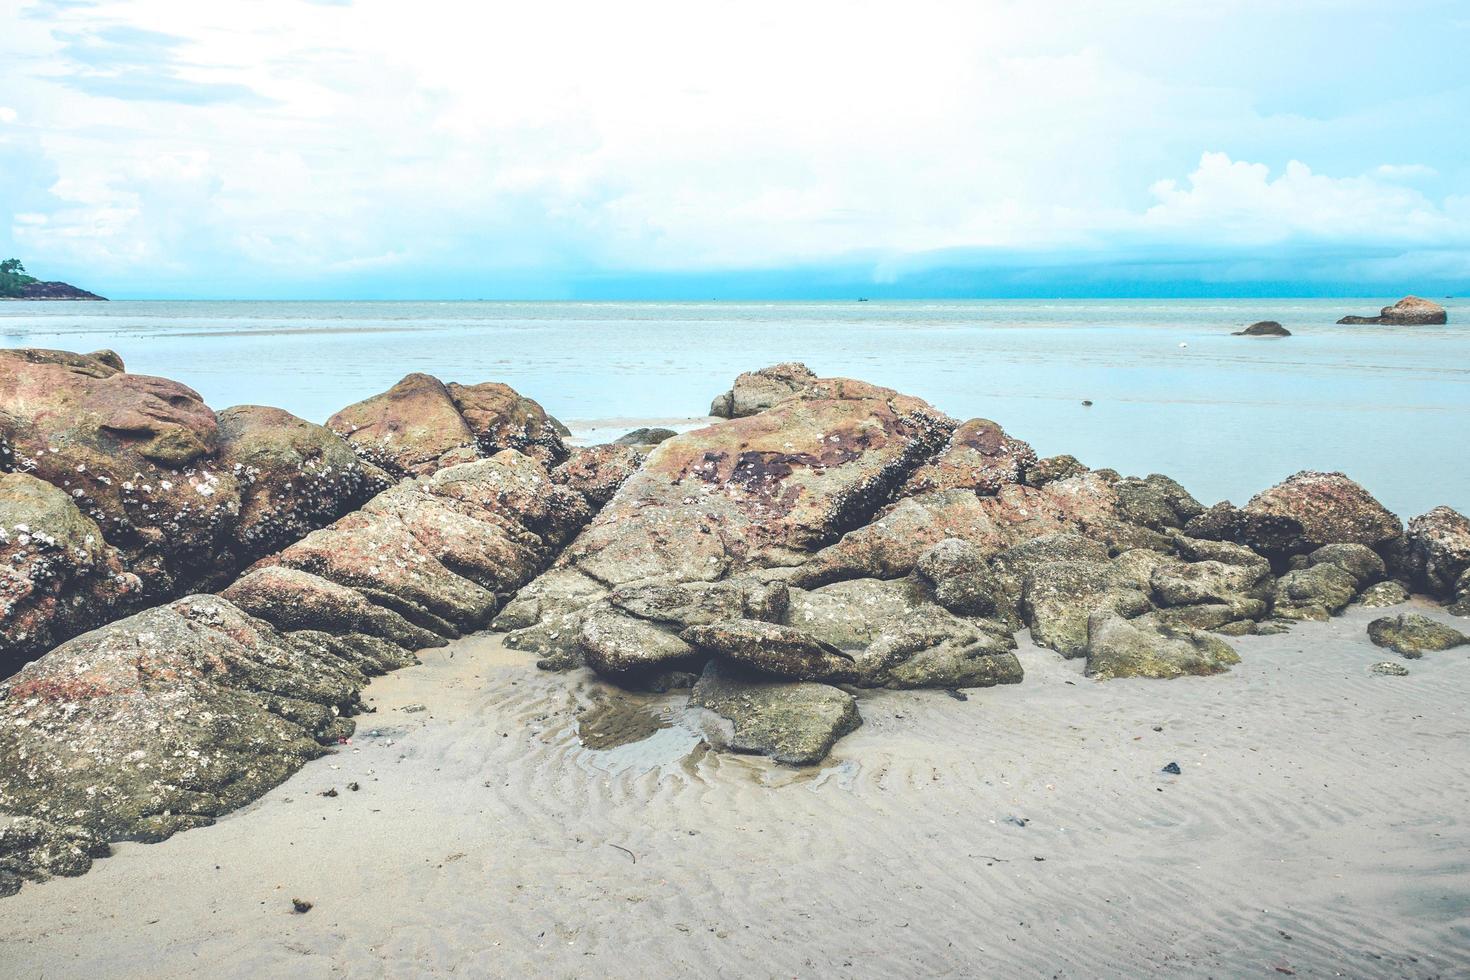 Felsen am Strand mit bewölktem blauem Himmel foto